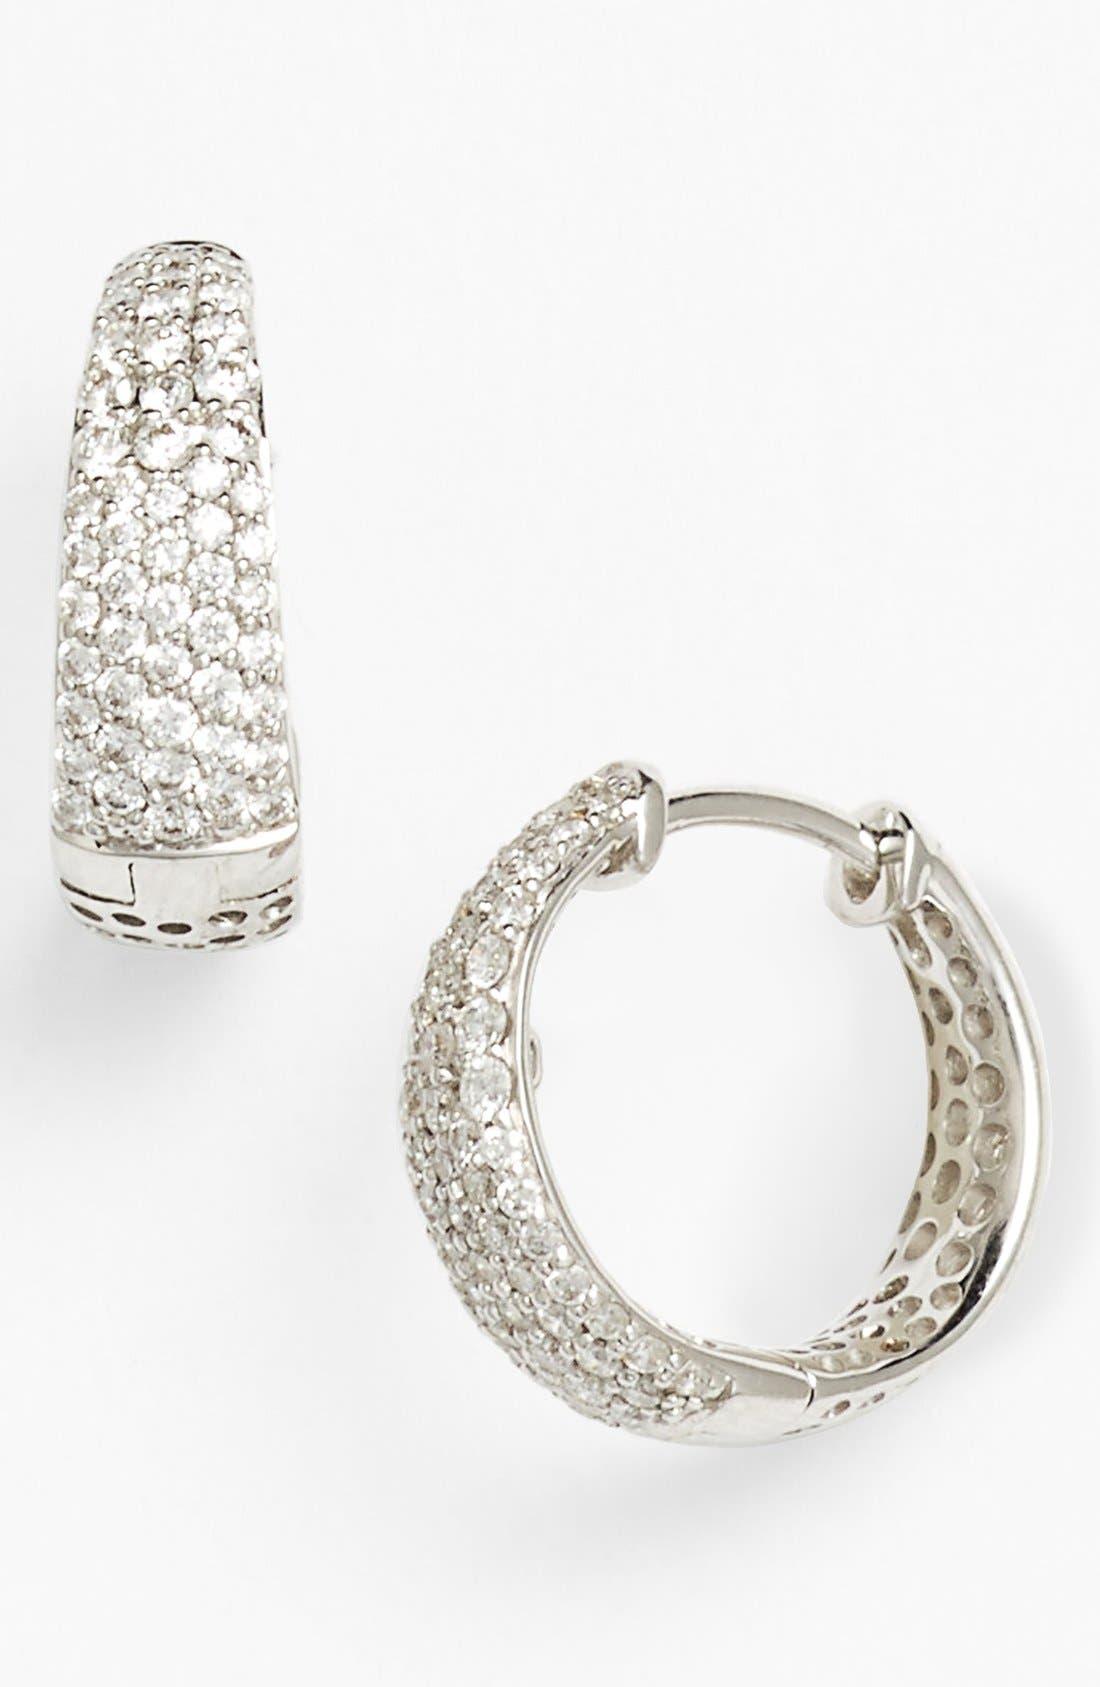 Alternate Image 1 Selected - Roberto Coin 'Scalare' Diamond Hoop Earrings